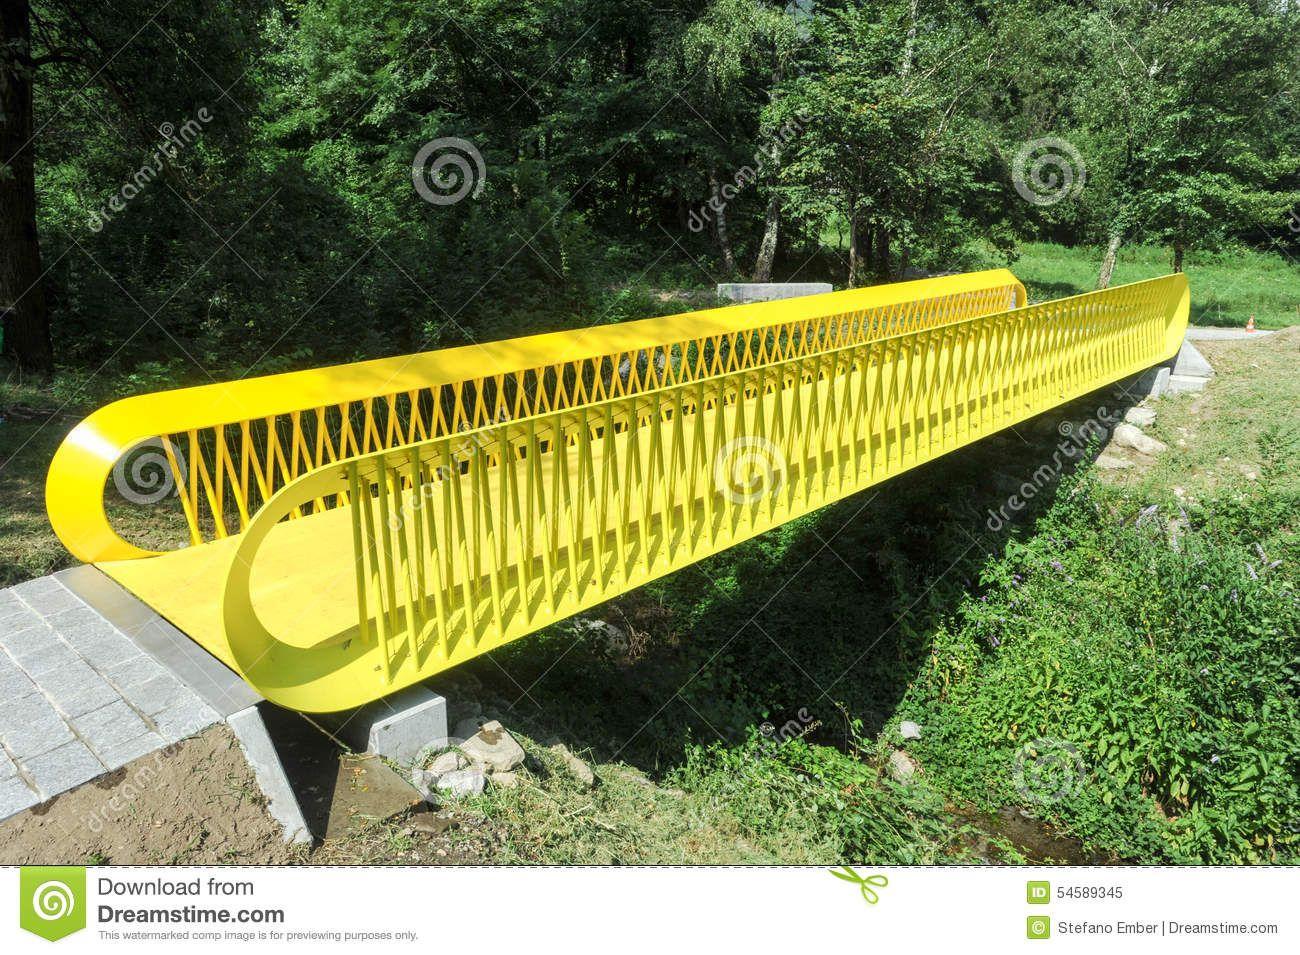 pont-futuriste-jaune-54589345.jpg (1300×955)